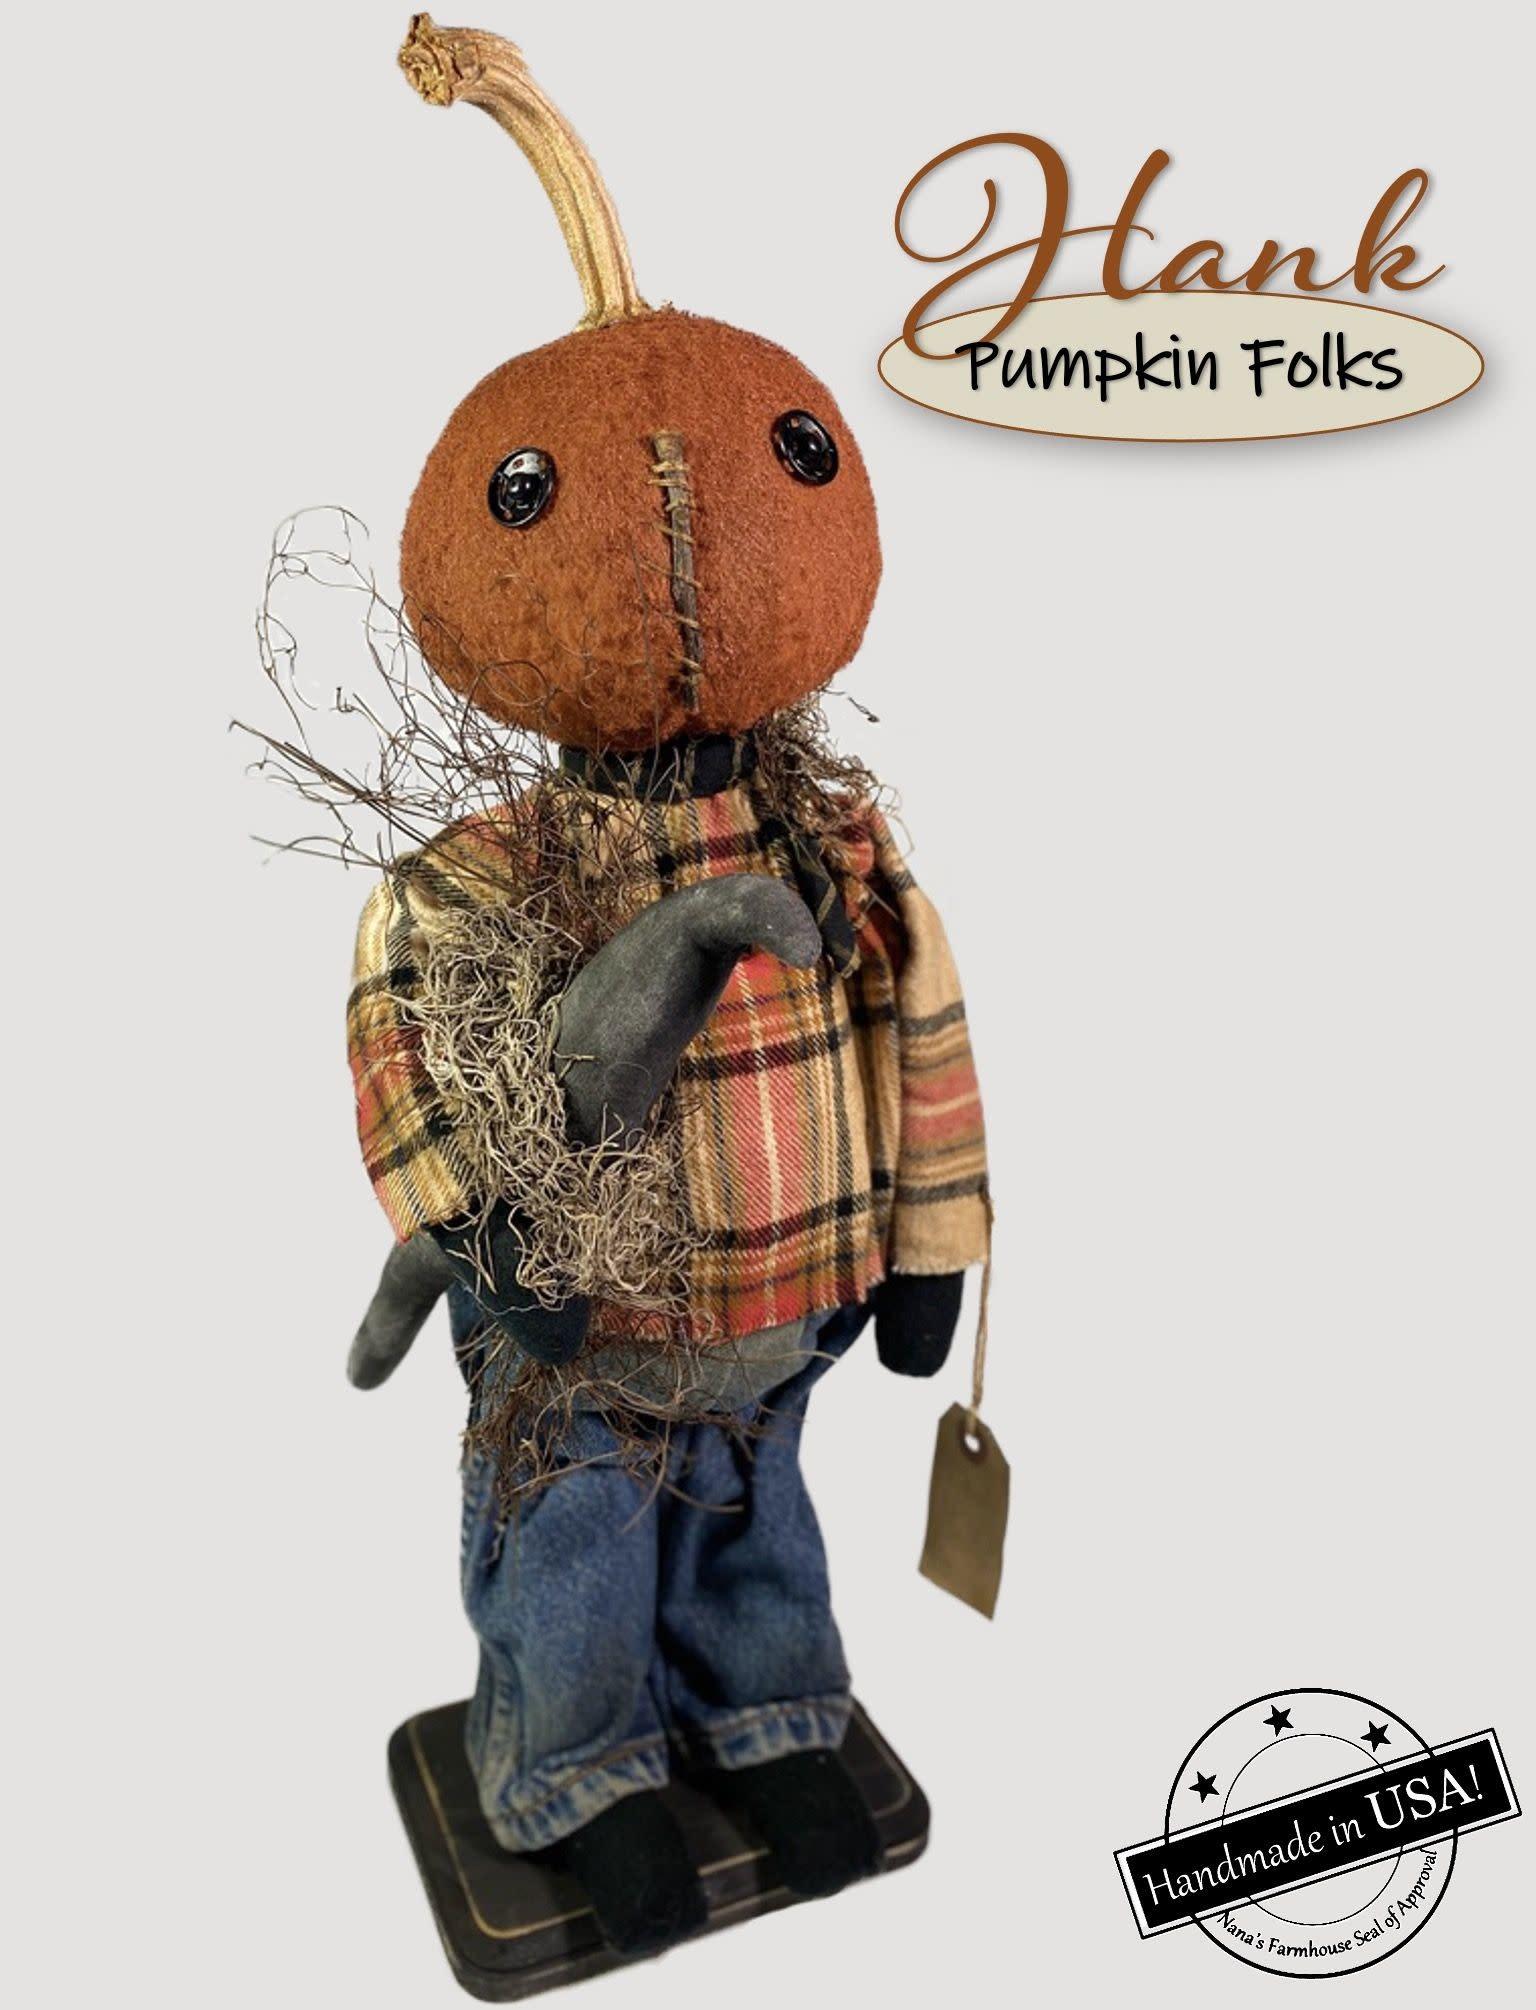 Nana's Farmhouse Hank The Pumpkin Doll Holding Black Crow